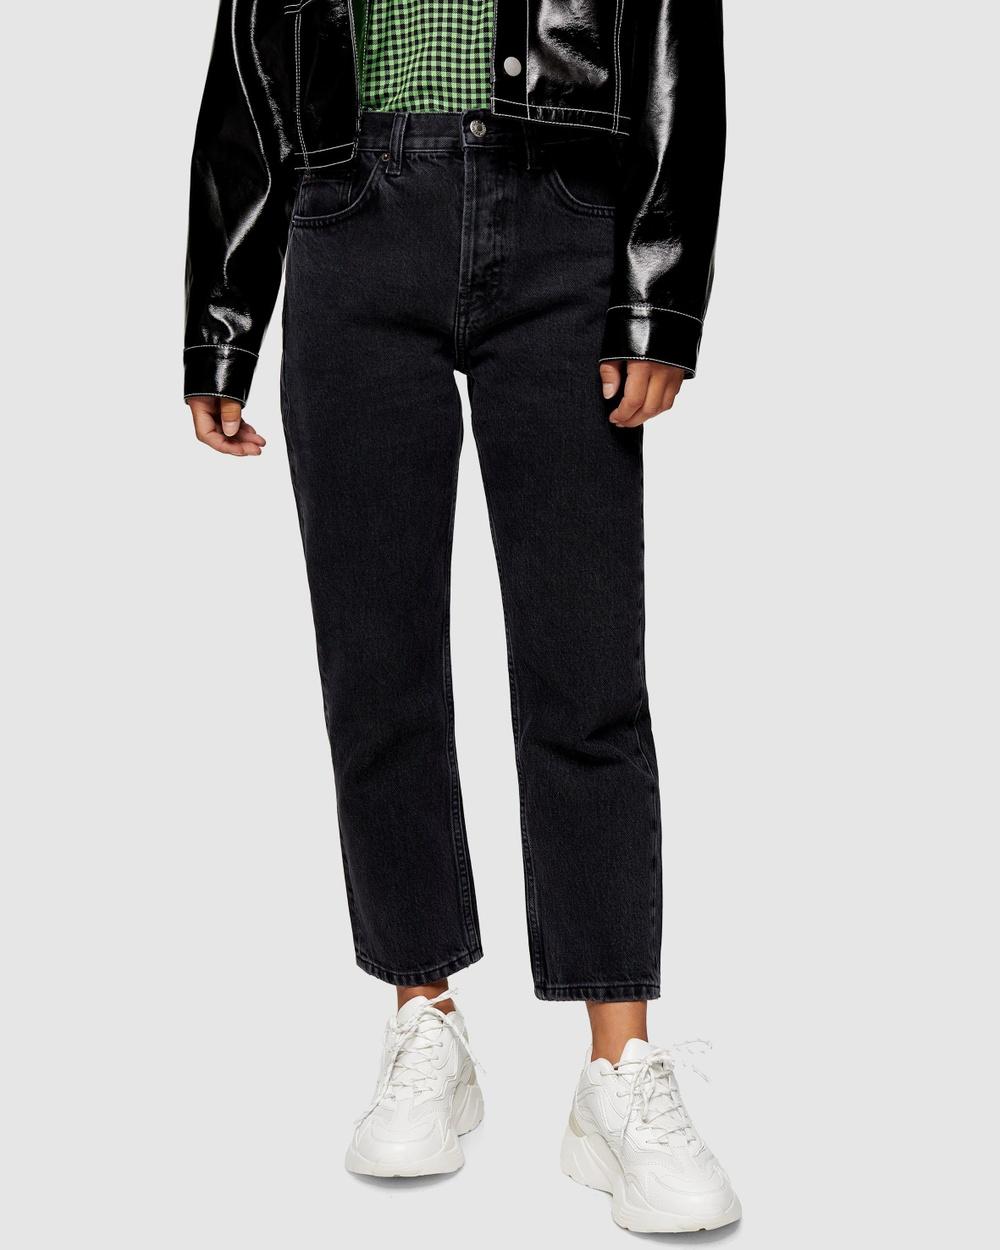 TOPSHOP Petite Editor Jeans High-Waisted Black Australia